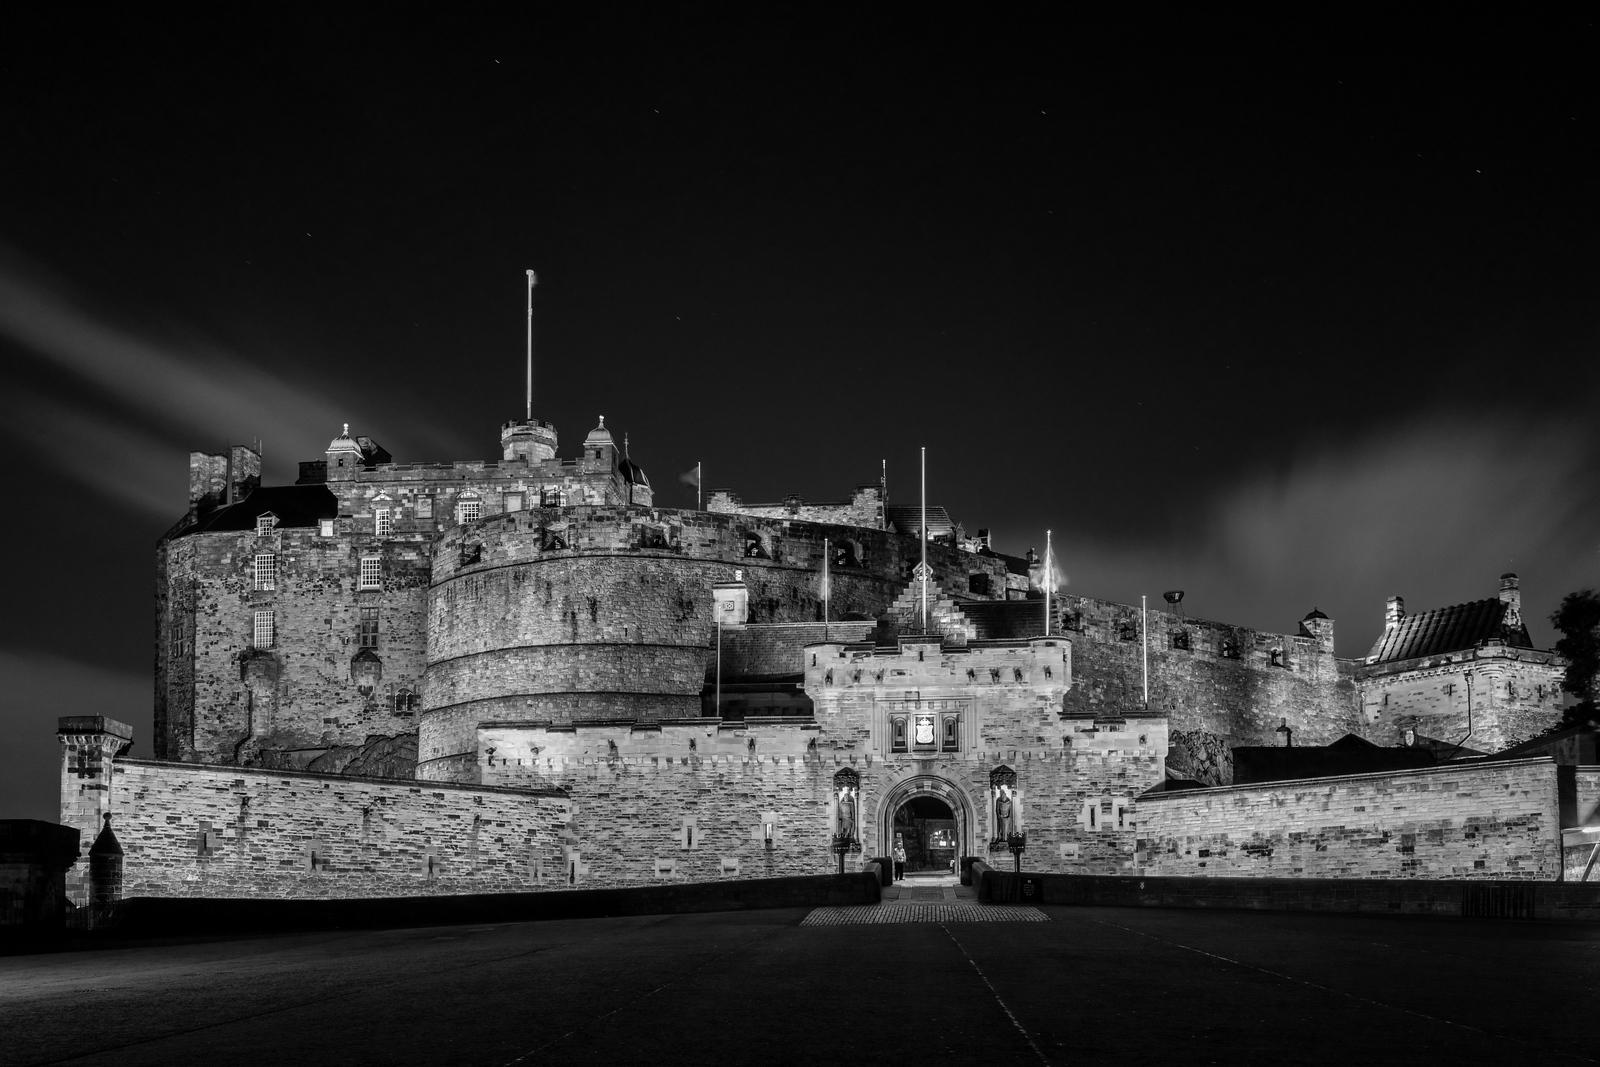 Scotland, Great Britain, United Kingdom